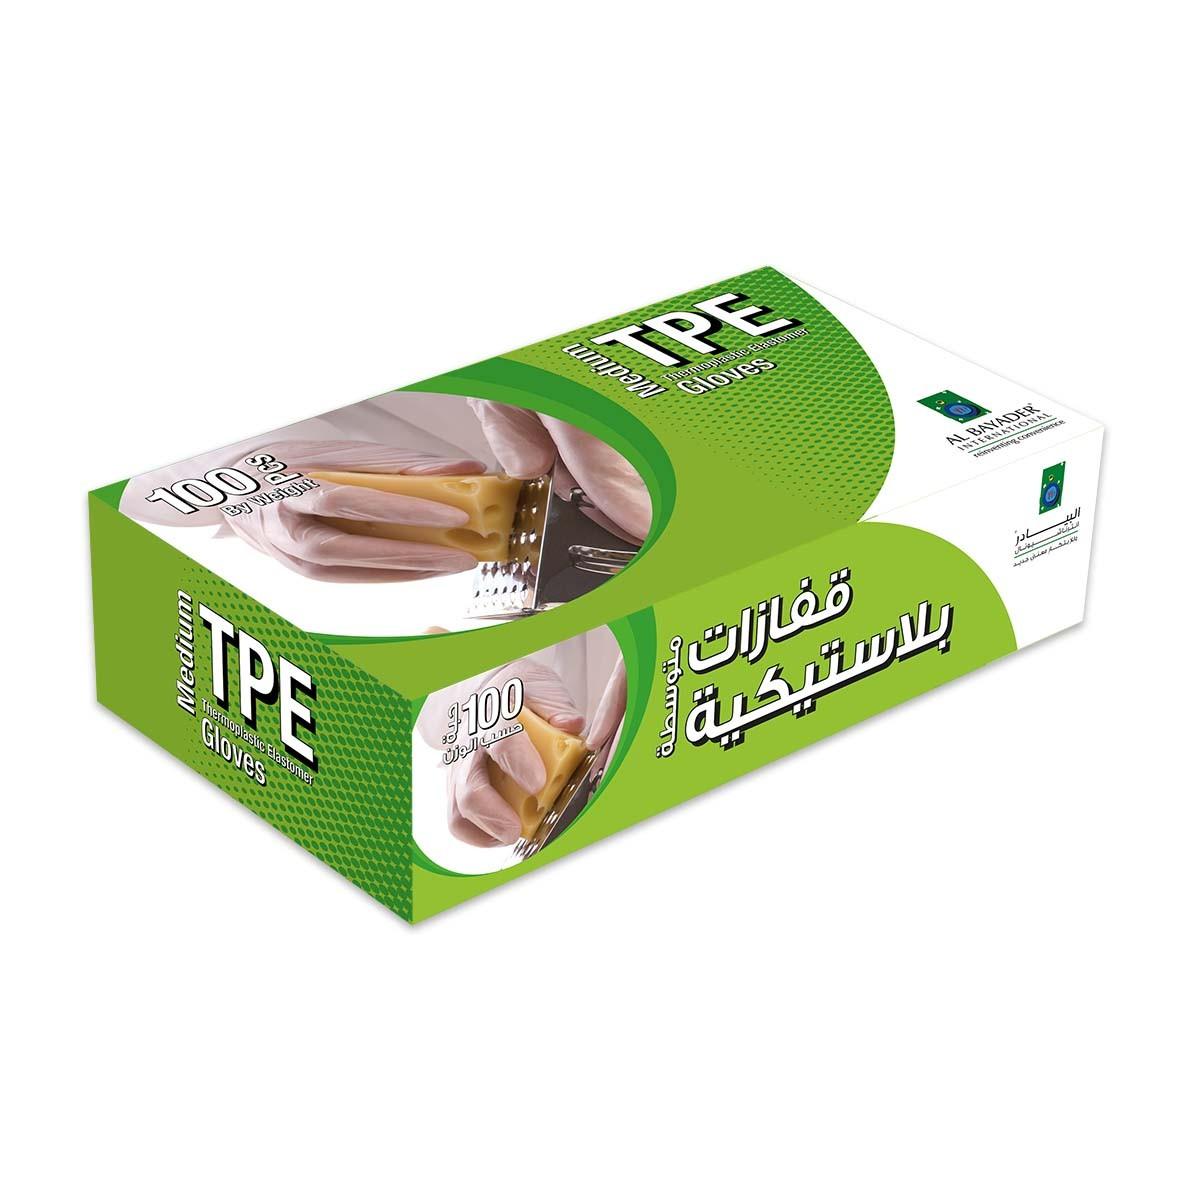 Disposable TPE Gloves - Medium   100pcsx10pkts